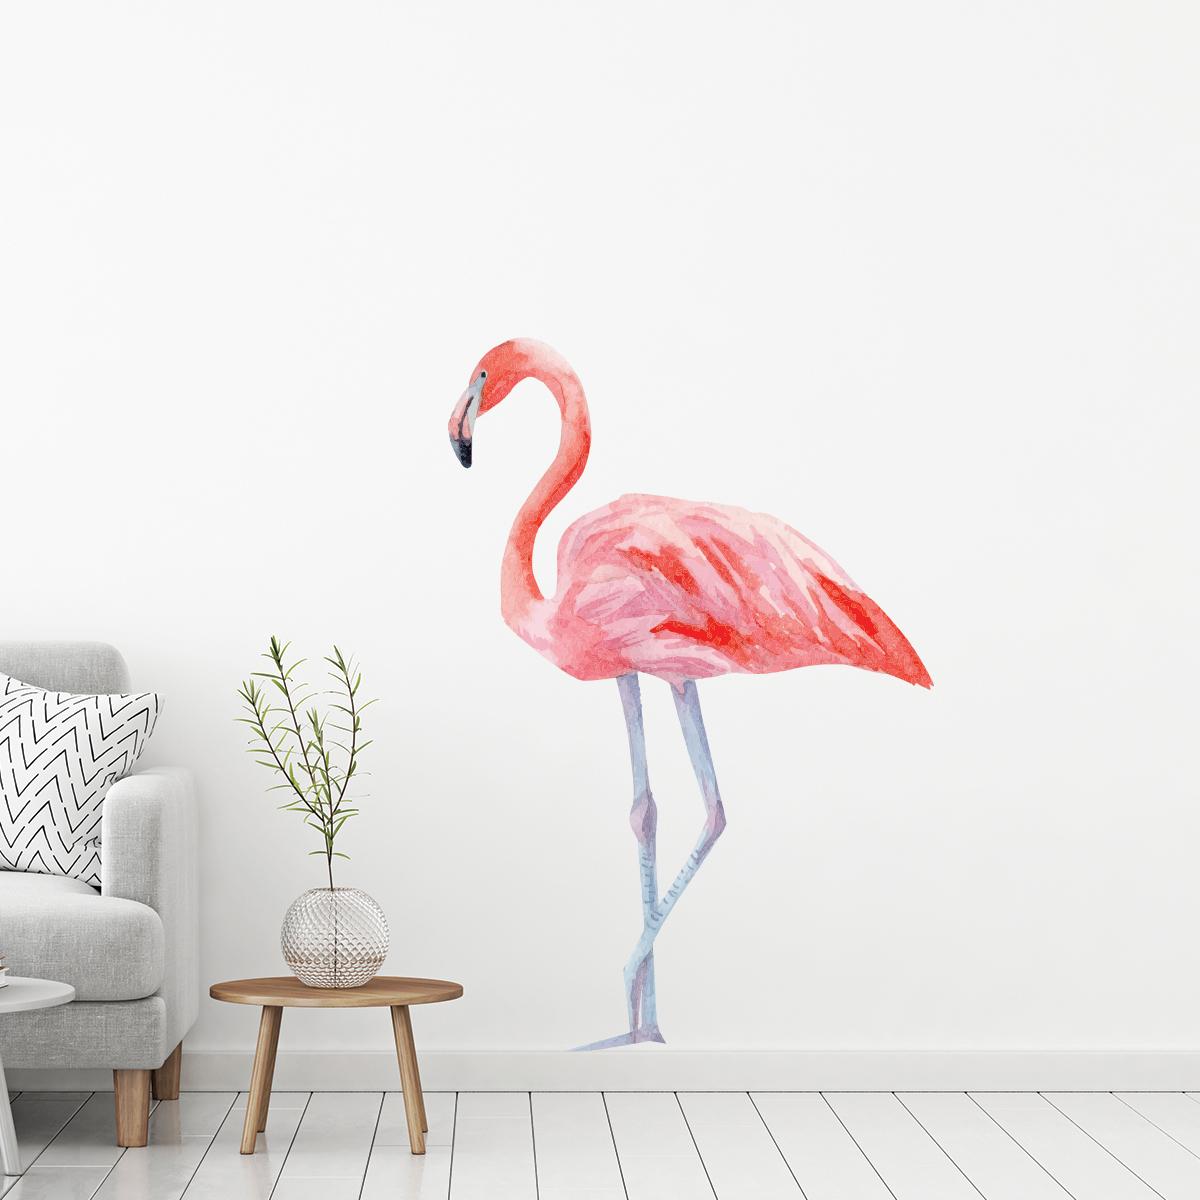 Salle De Bain Gris Beige Marron ~ sticker flamant rose stickers animaux oiseaux ambiance sticker